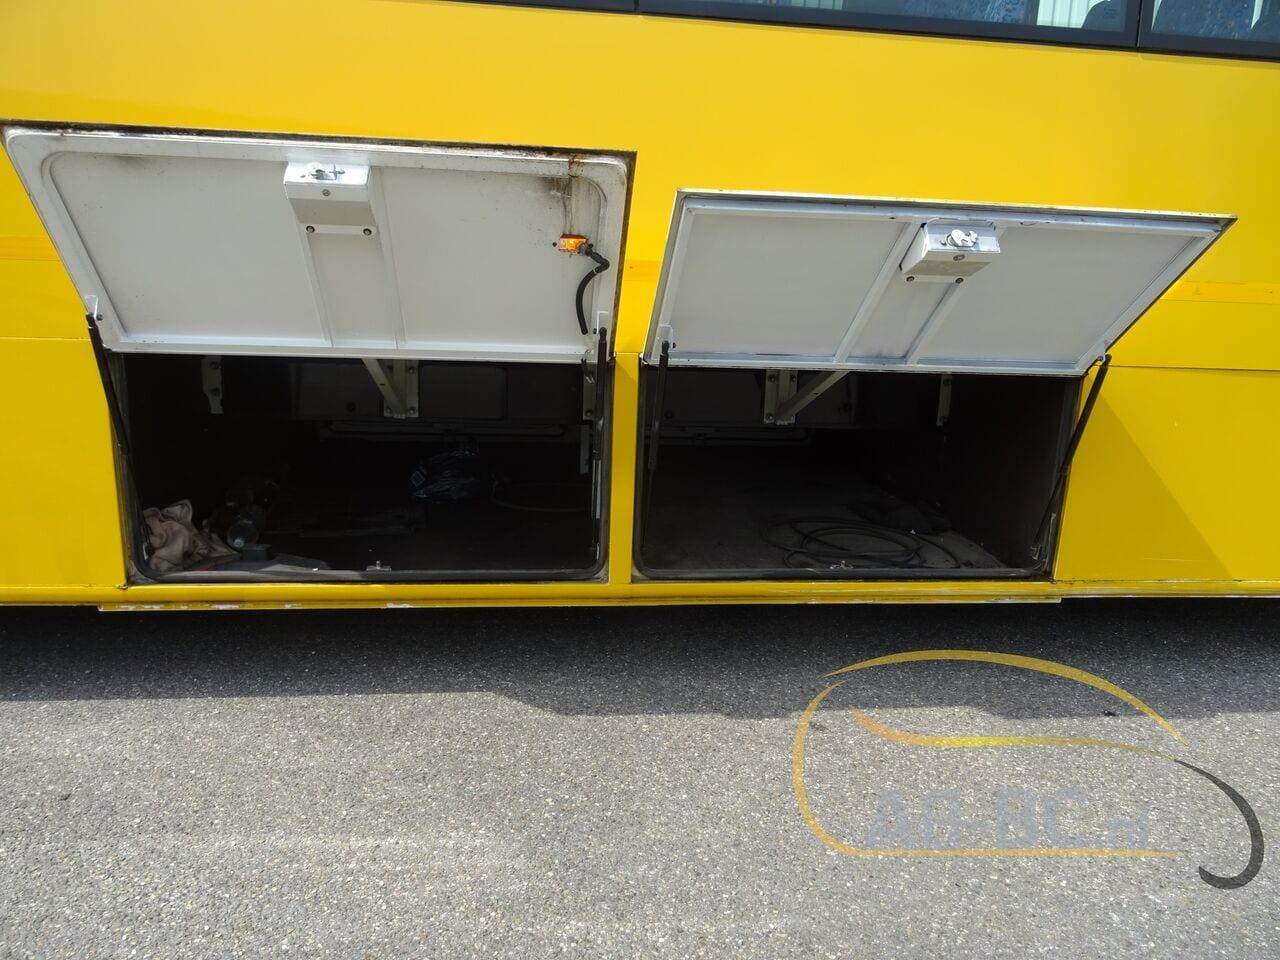 interurban-busMAN-Fast-64-seats---1619619787532646683_big_e8ed5094da99eec2cf8226dd16acf220--21042817163019598600